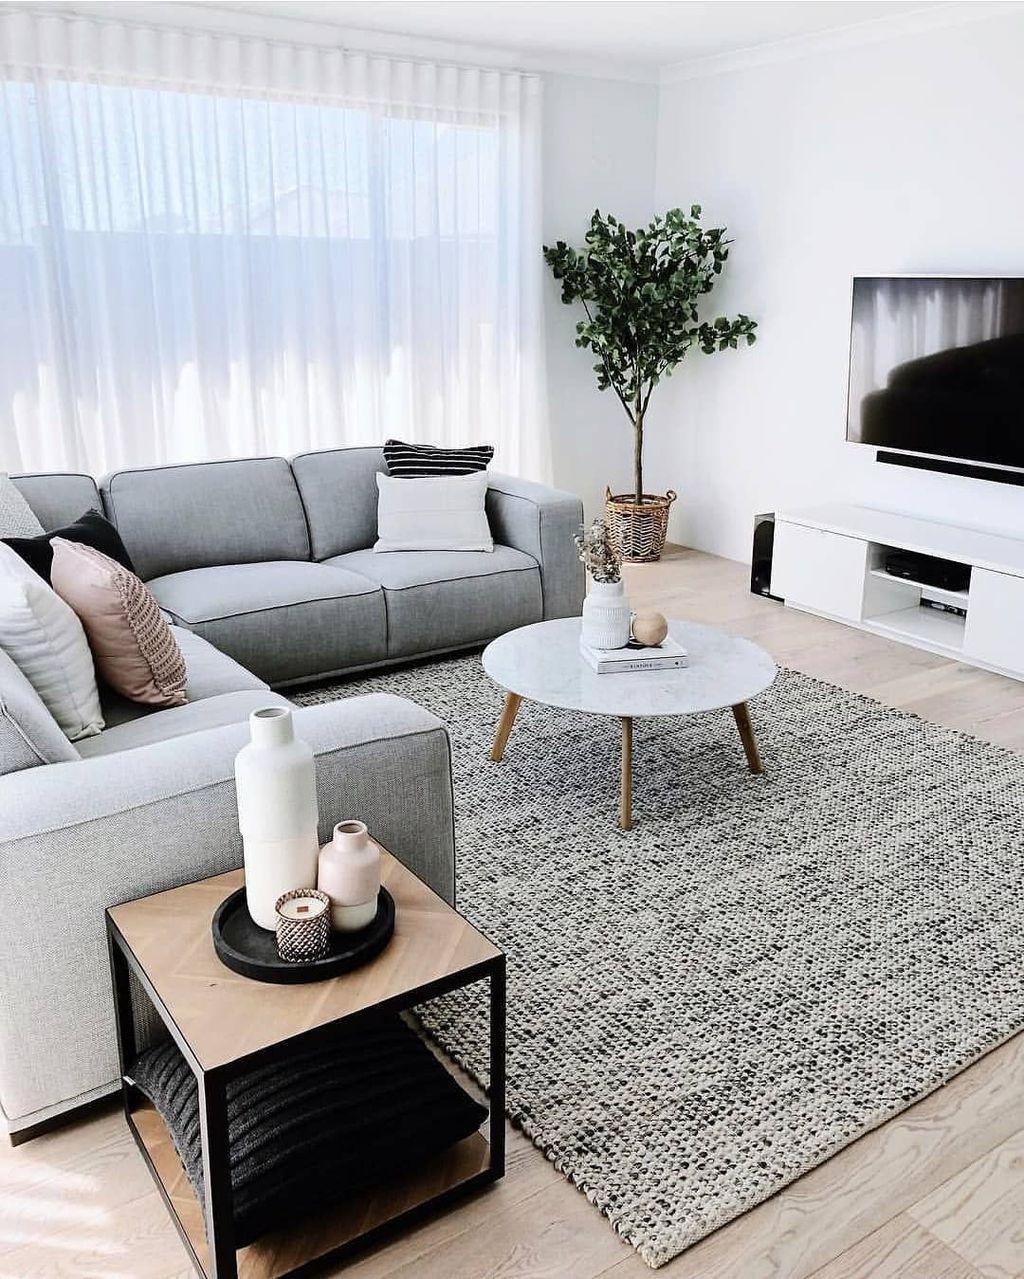 Excellent Furniture Design Ideas For Your Living Room 30